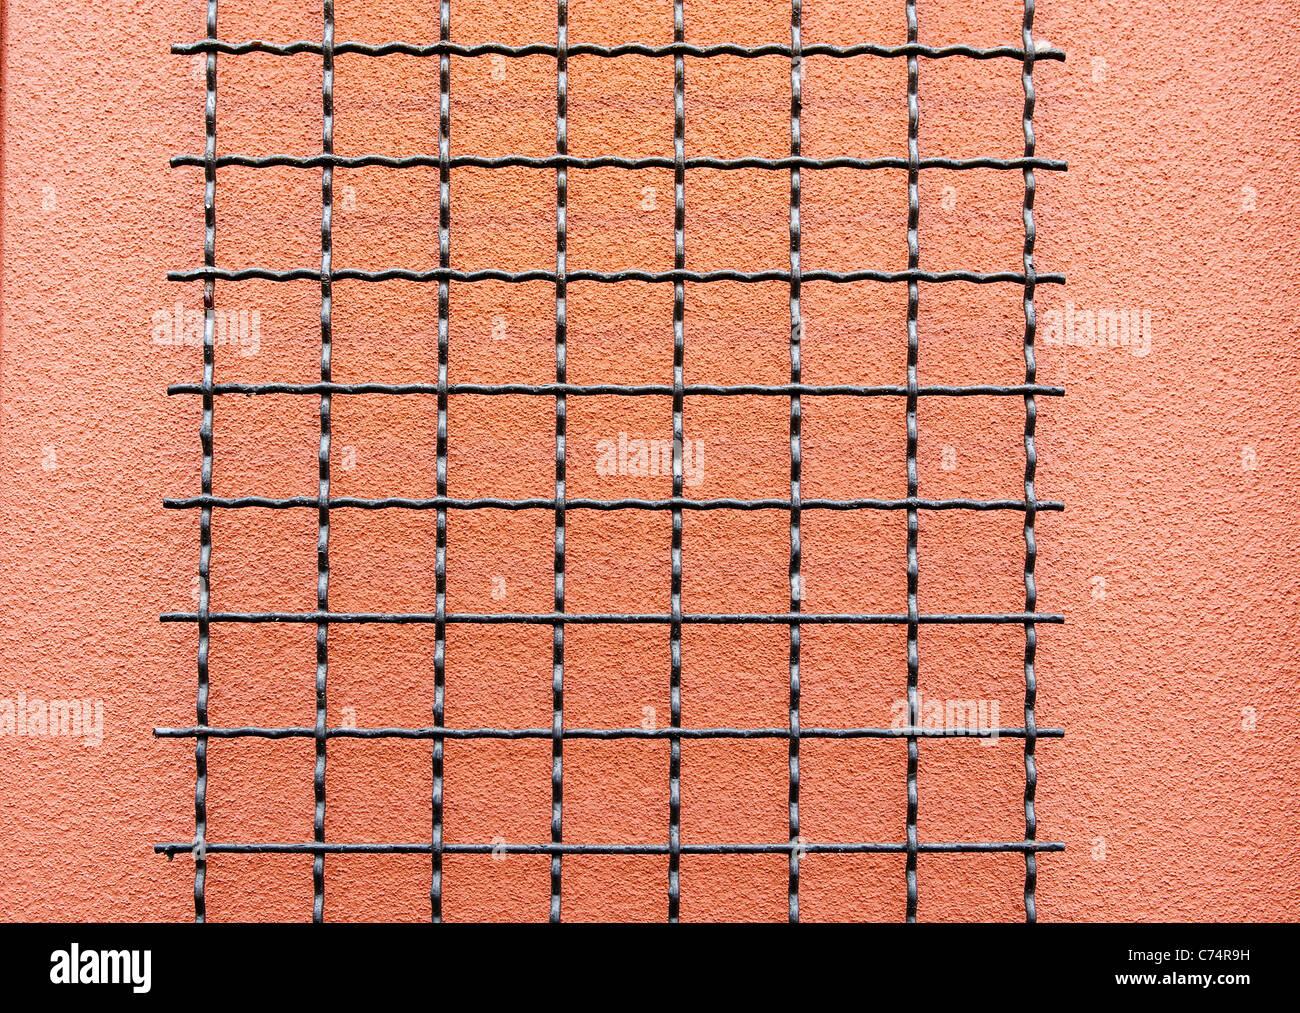 Fantastisch 6 X 6 Drahtgitterplatten Fotos - Der Schaltplan ...